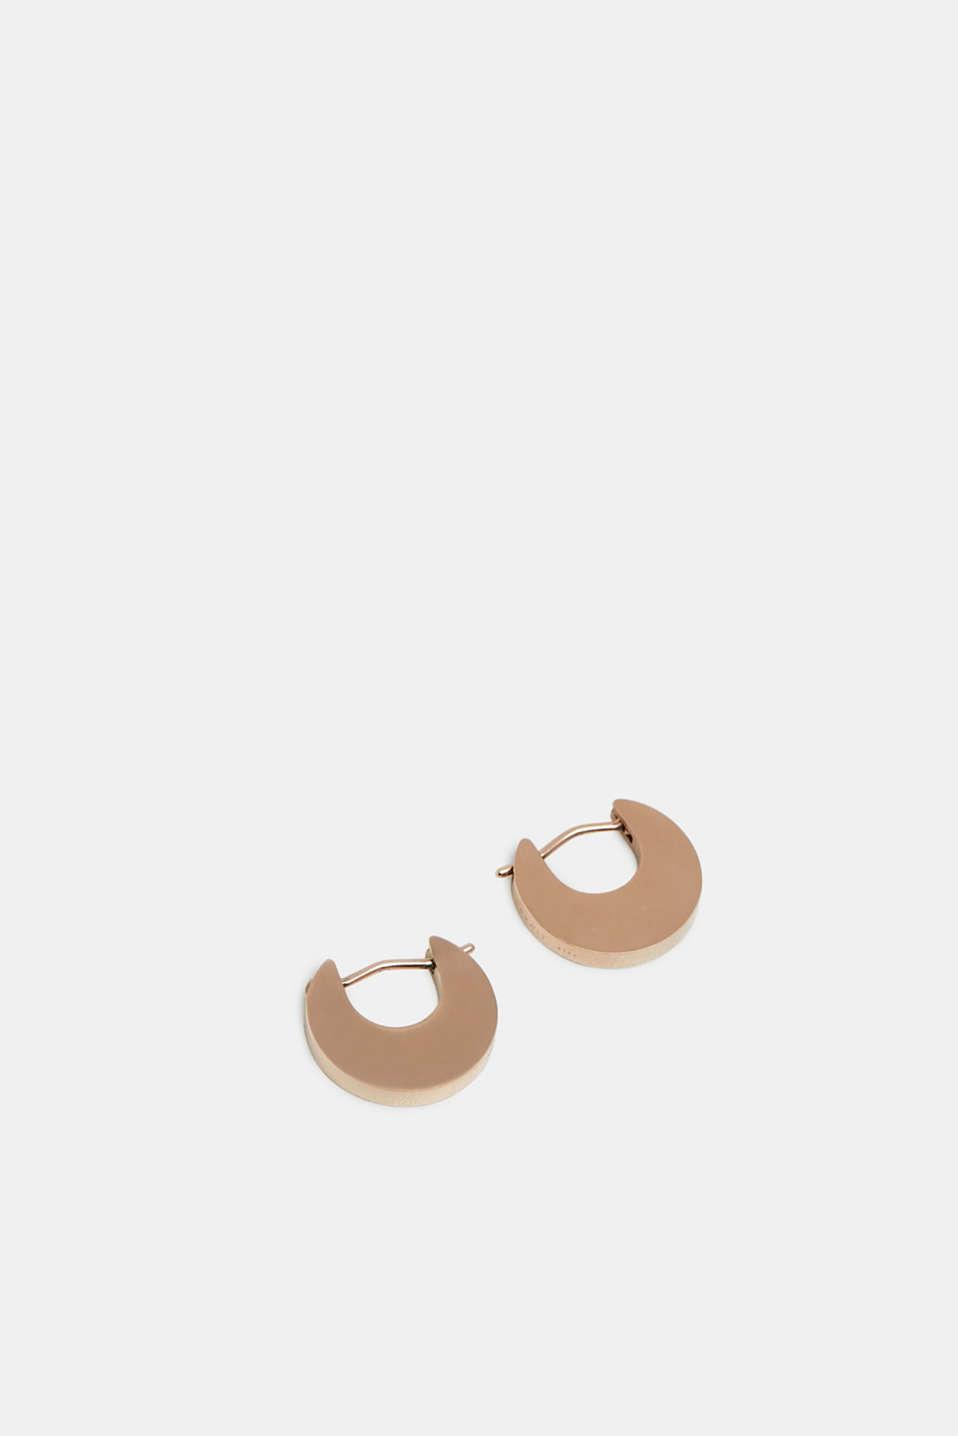 Stainless steel earrings, ROSEGOLD, detail image number 0